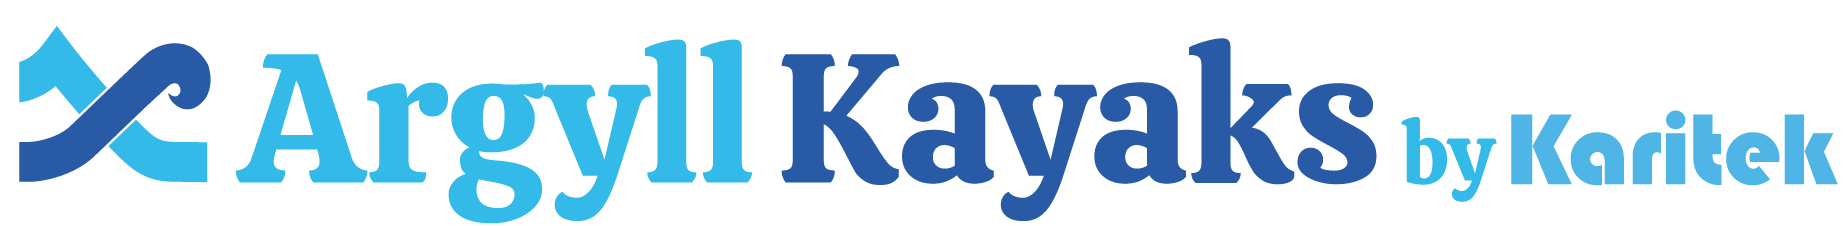 Argyll Kayaks - sea kayak, sit on top and SUP boats, boards, paddles and kit